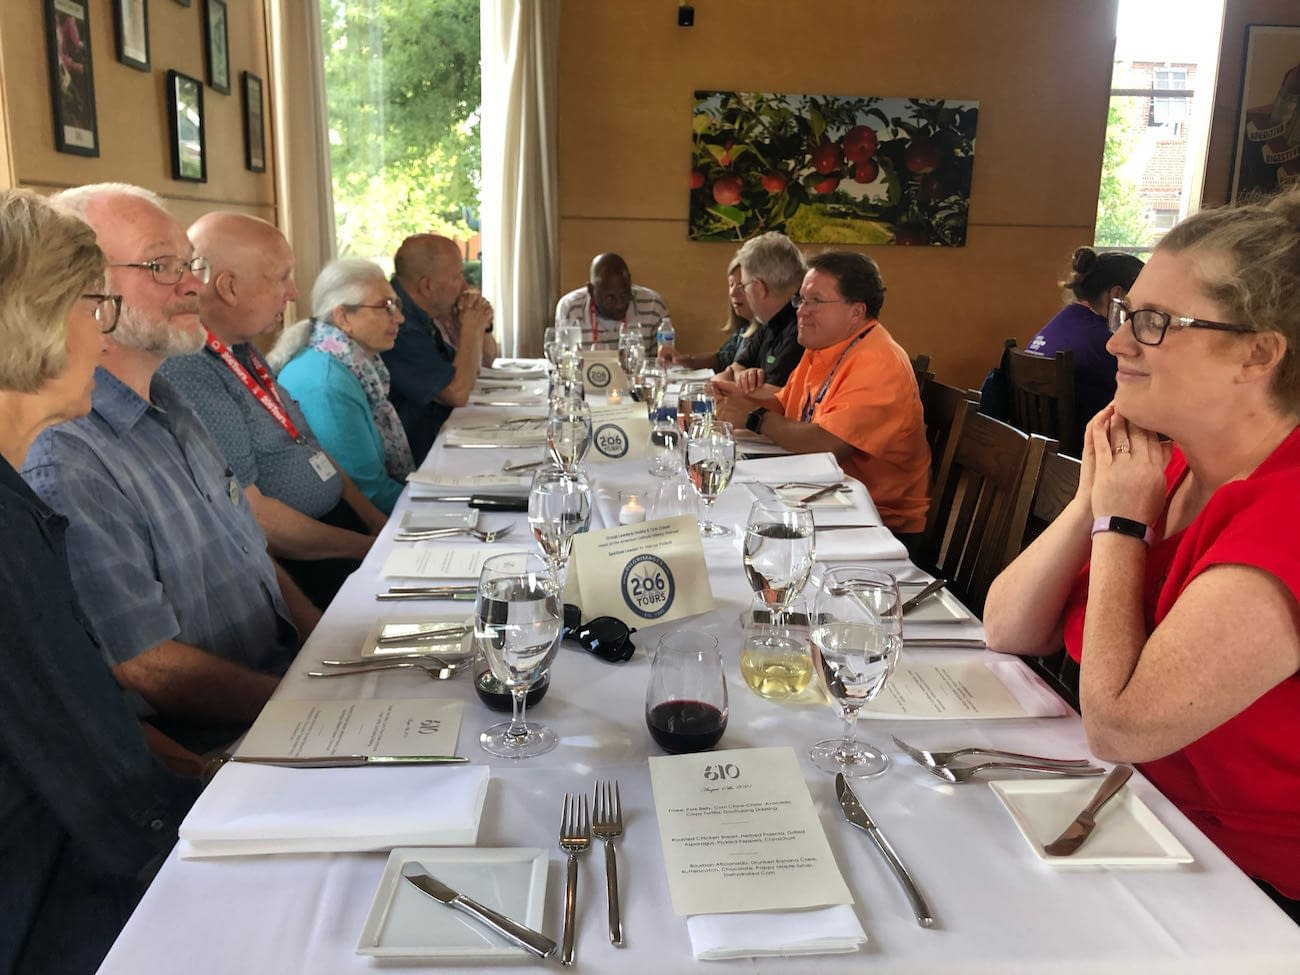 Table at 610 Magnolia